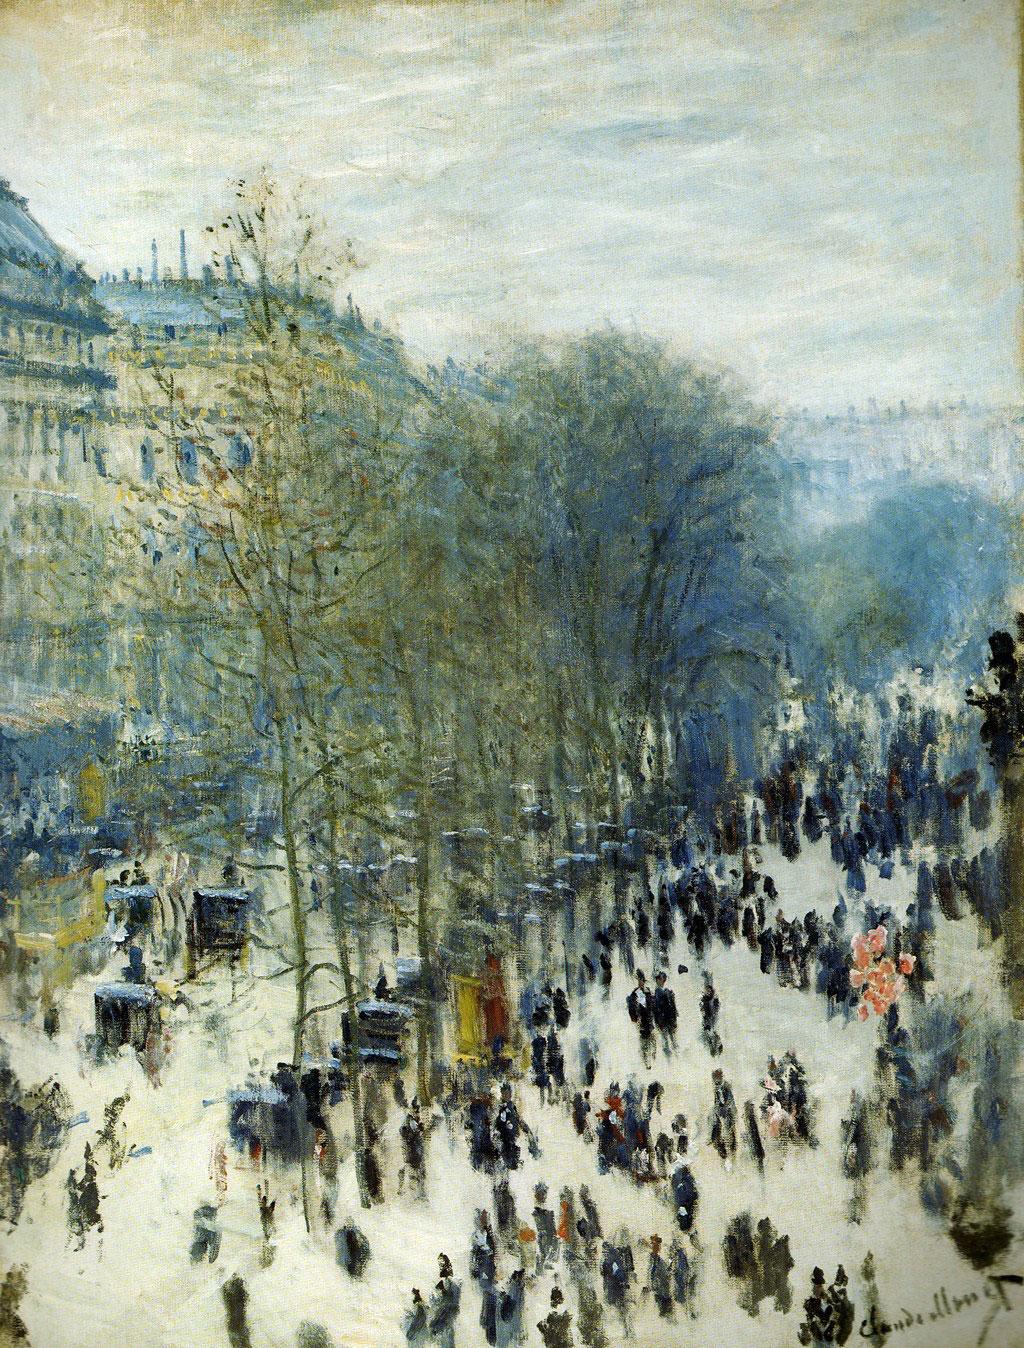 Boulevard des Capucines, Claude Monet